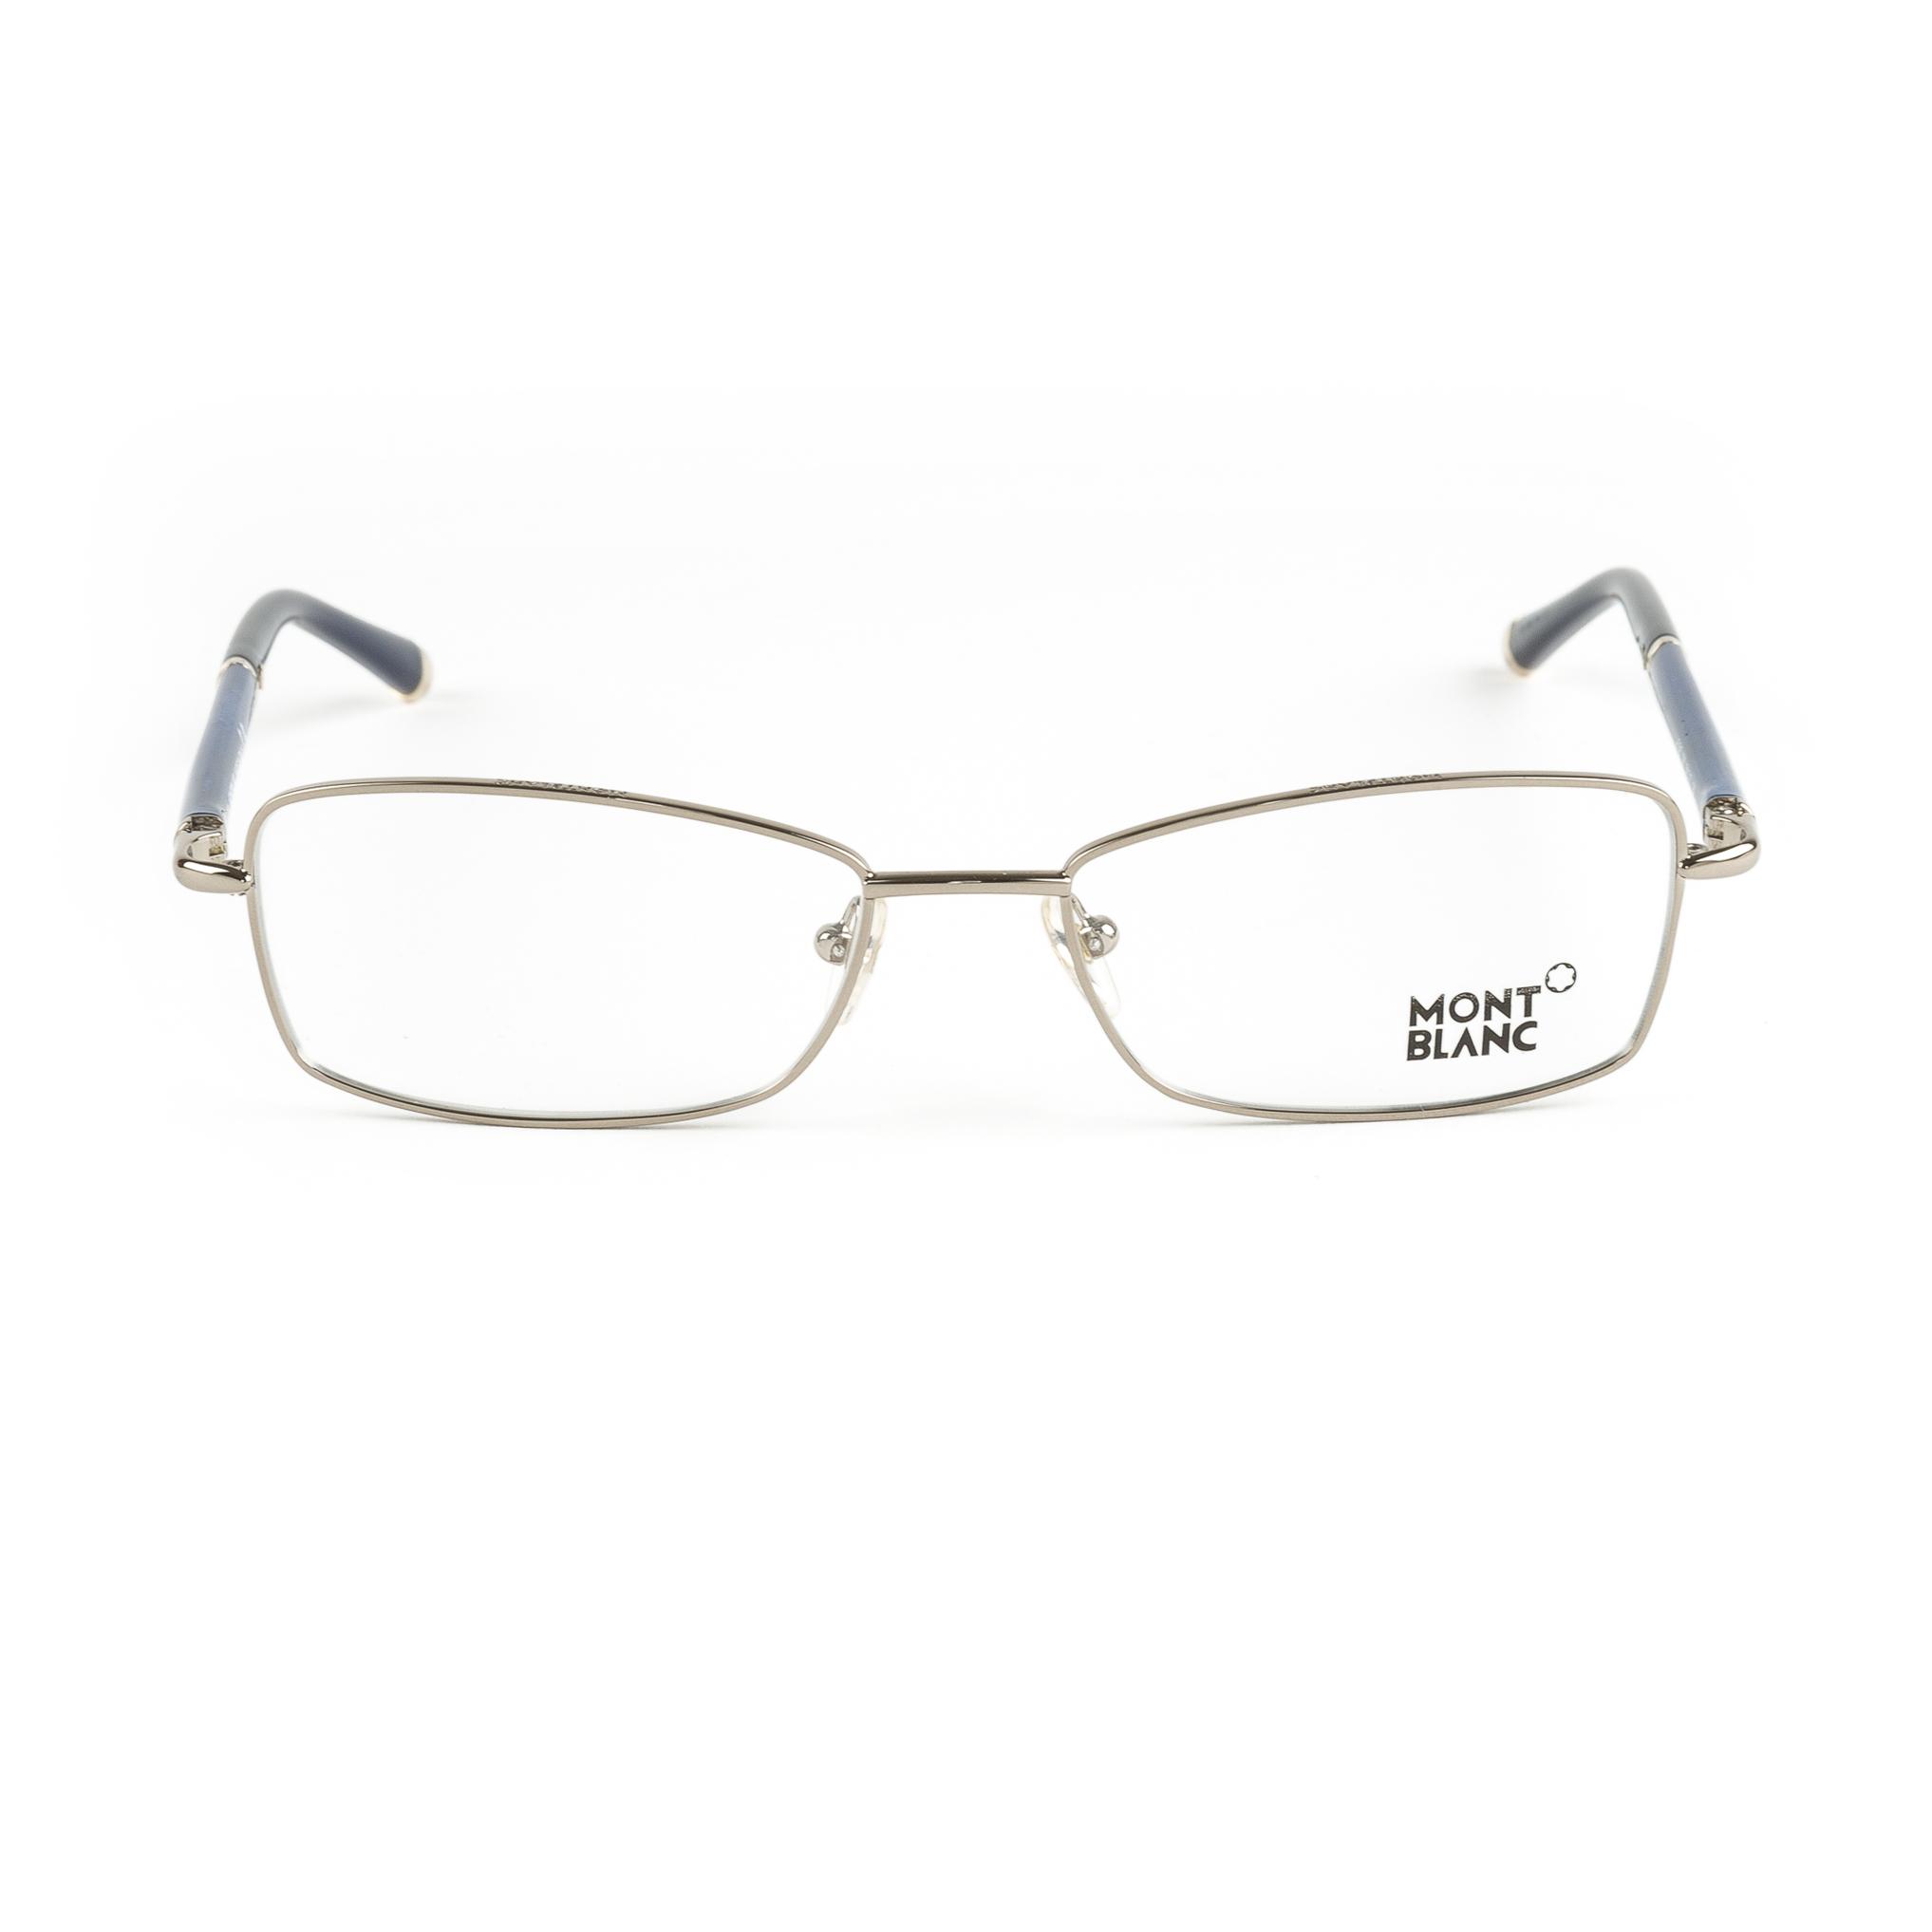 Eyeglass Frames Rectangular : Montblanc Rectangular Eyeglass Frames 54mm MB345 NEW eBay